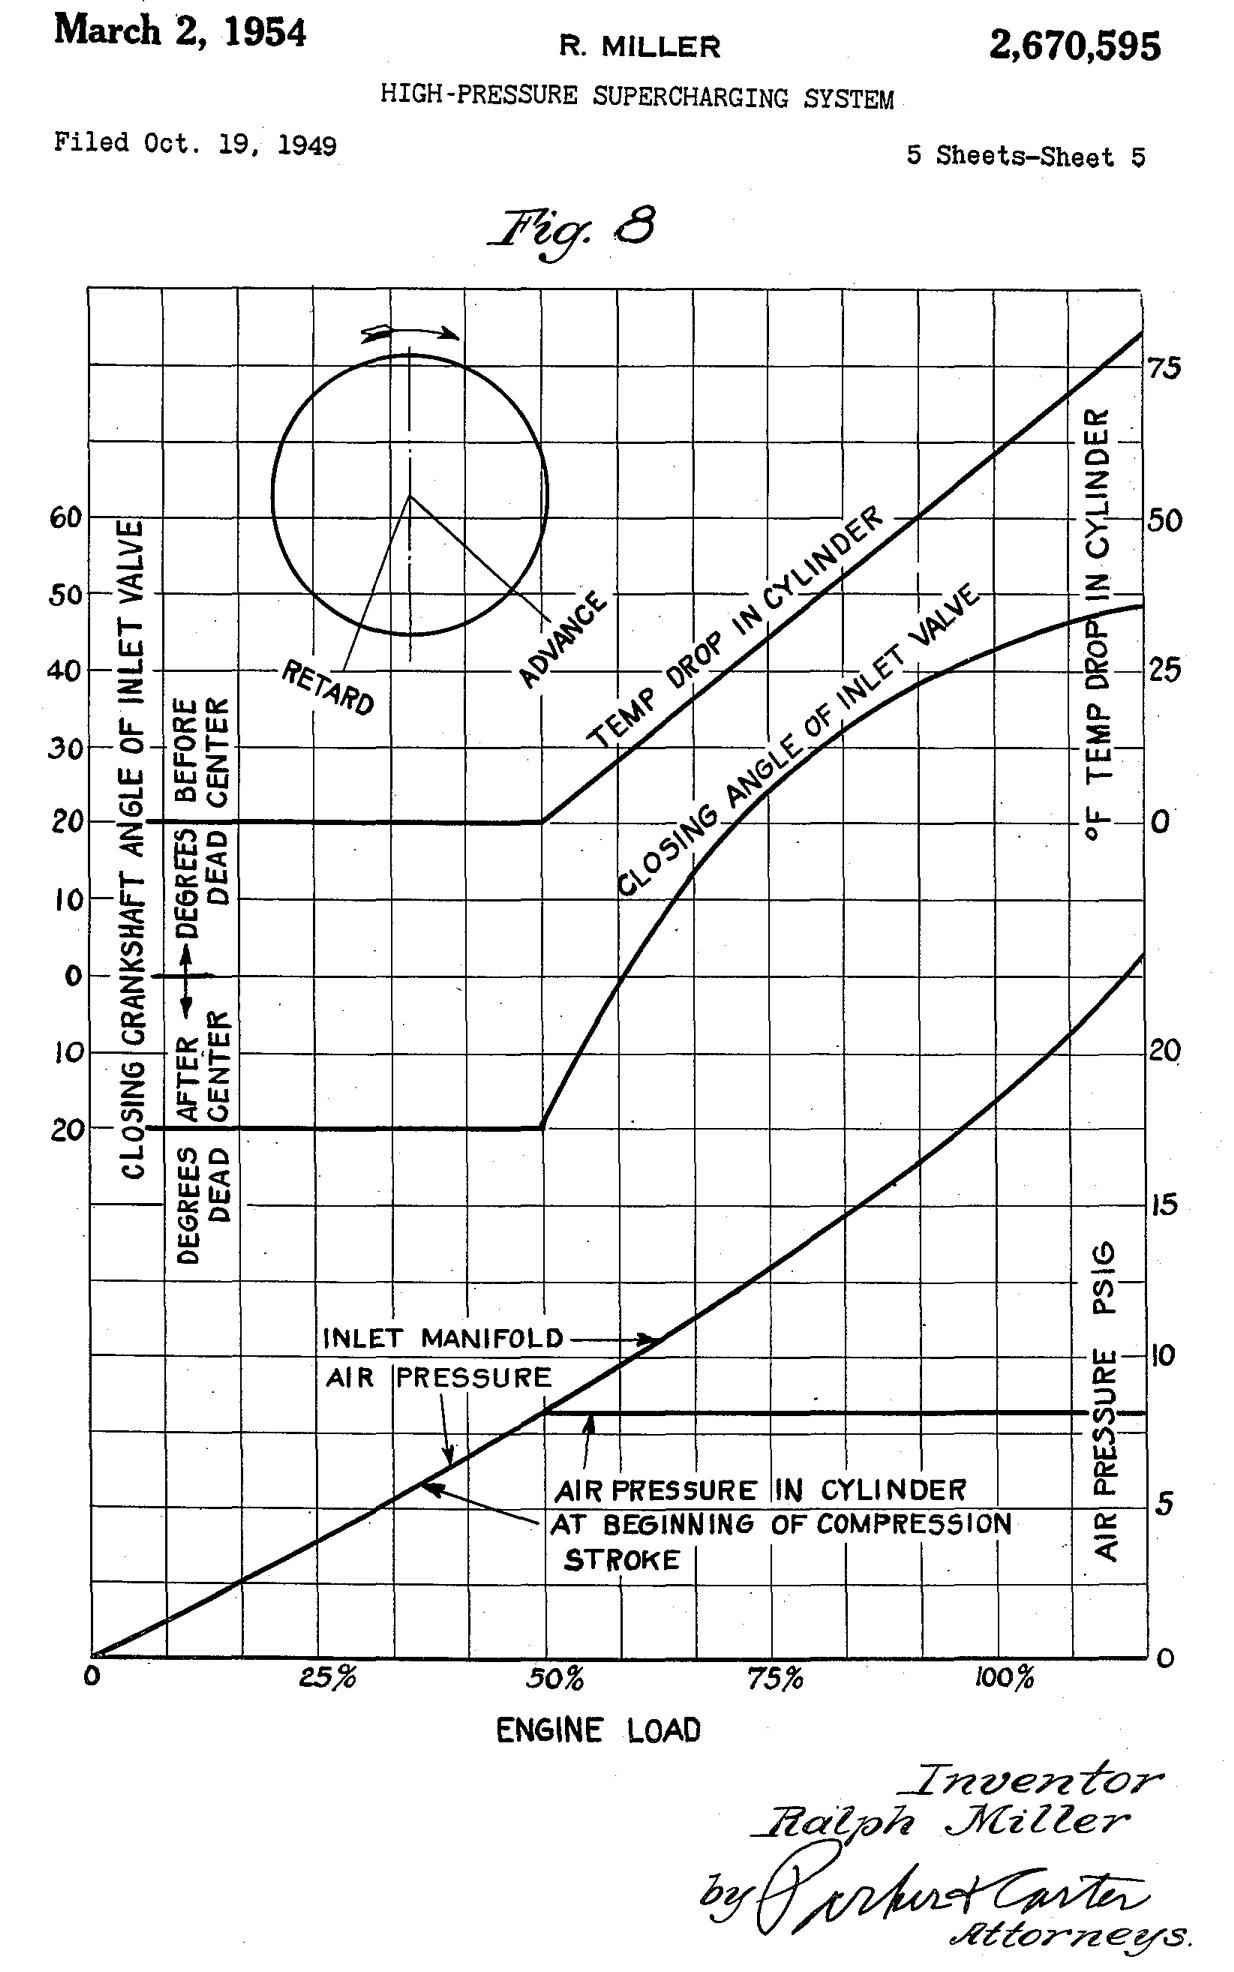 Valve Timing Diagram For Four Strokesel Engine